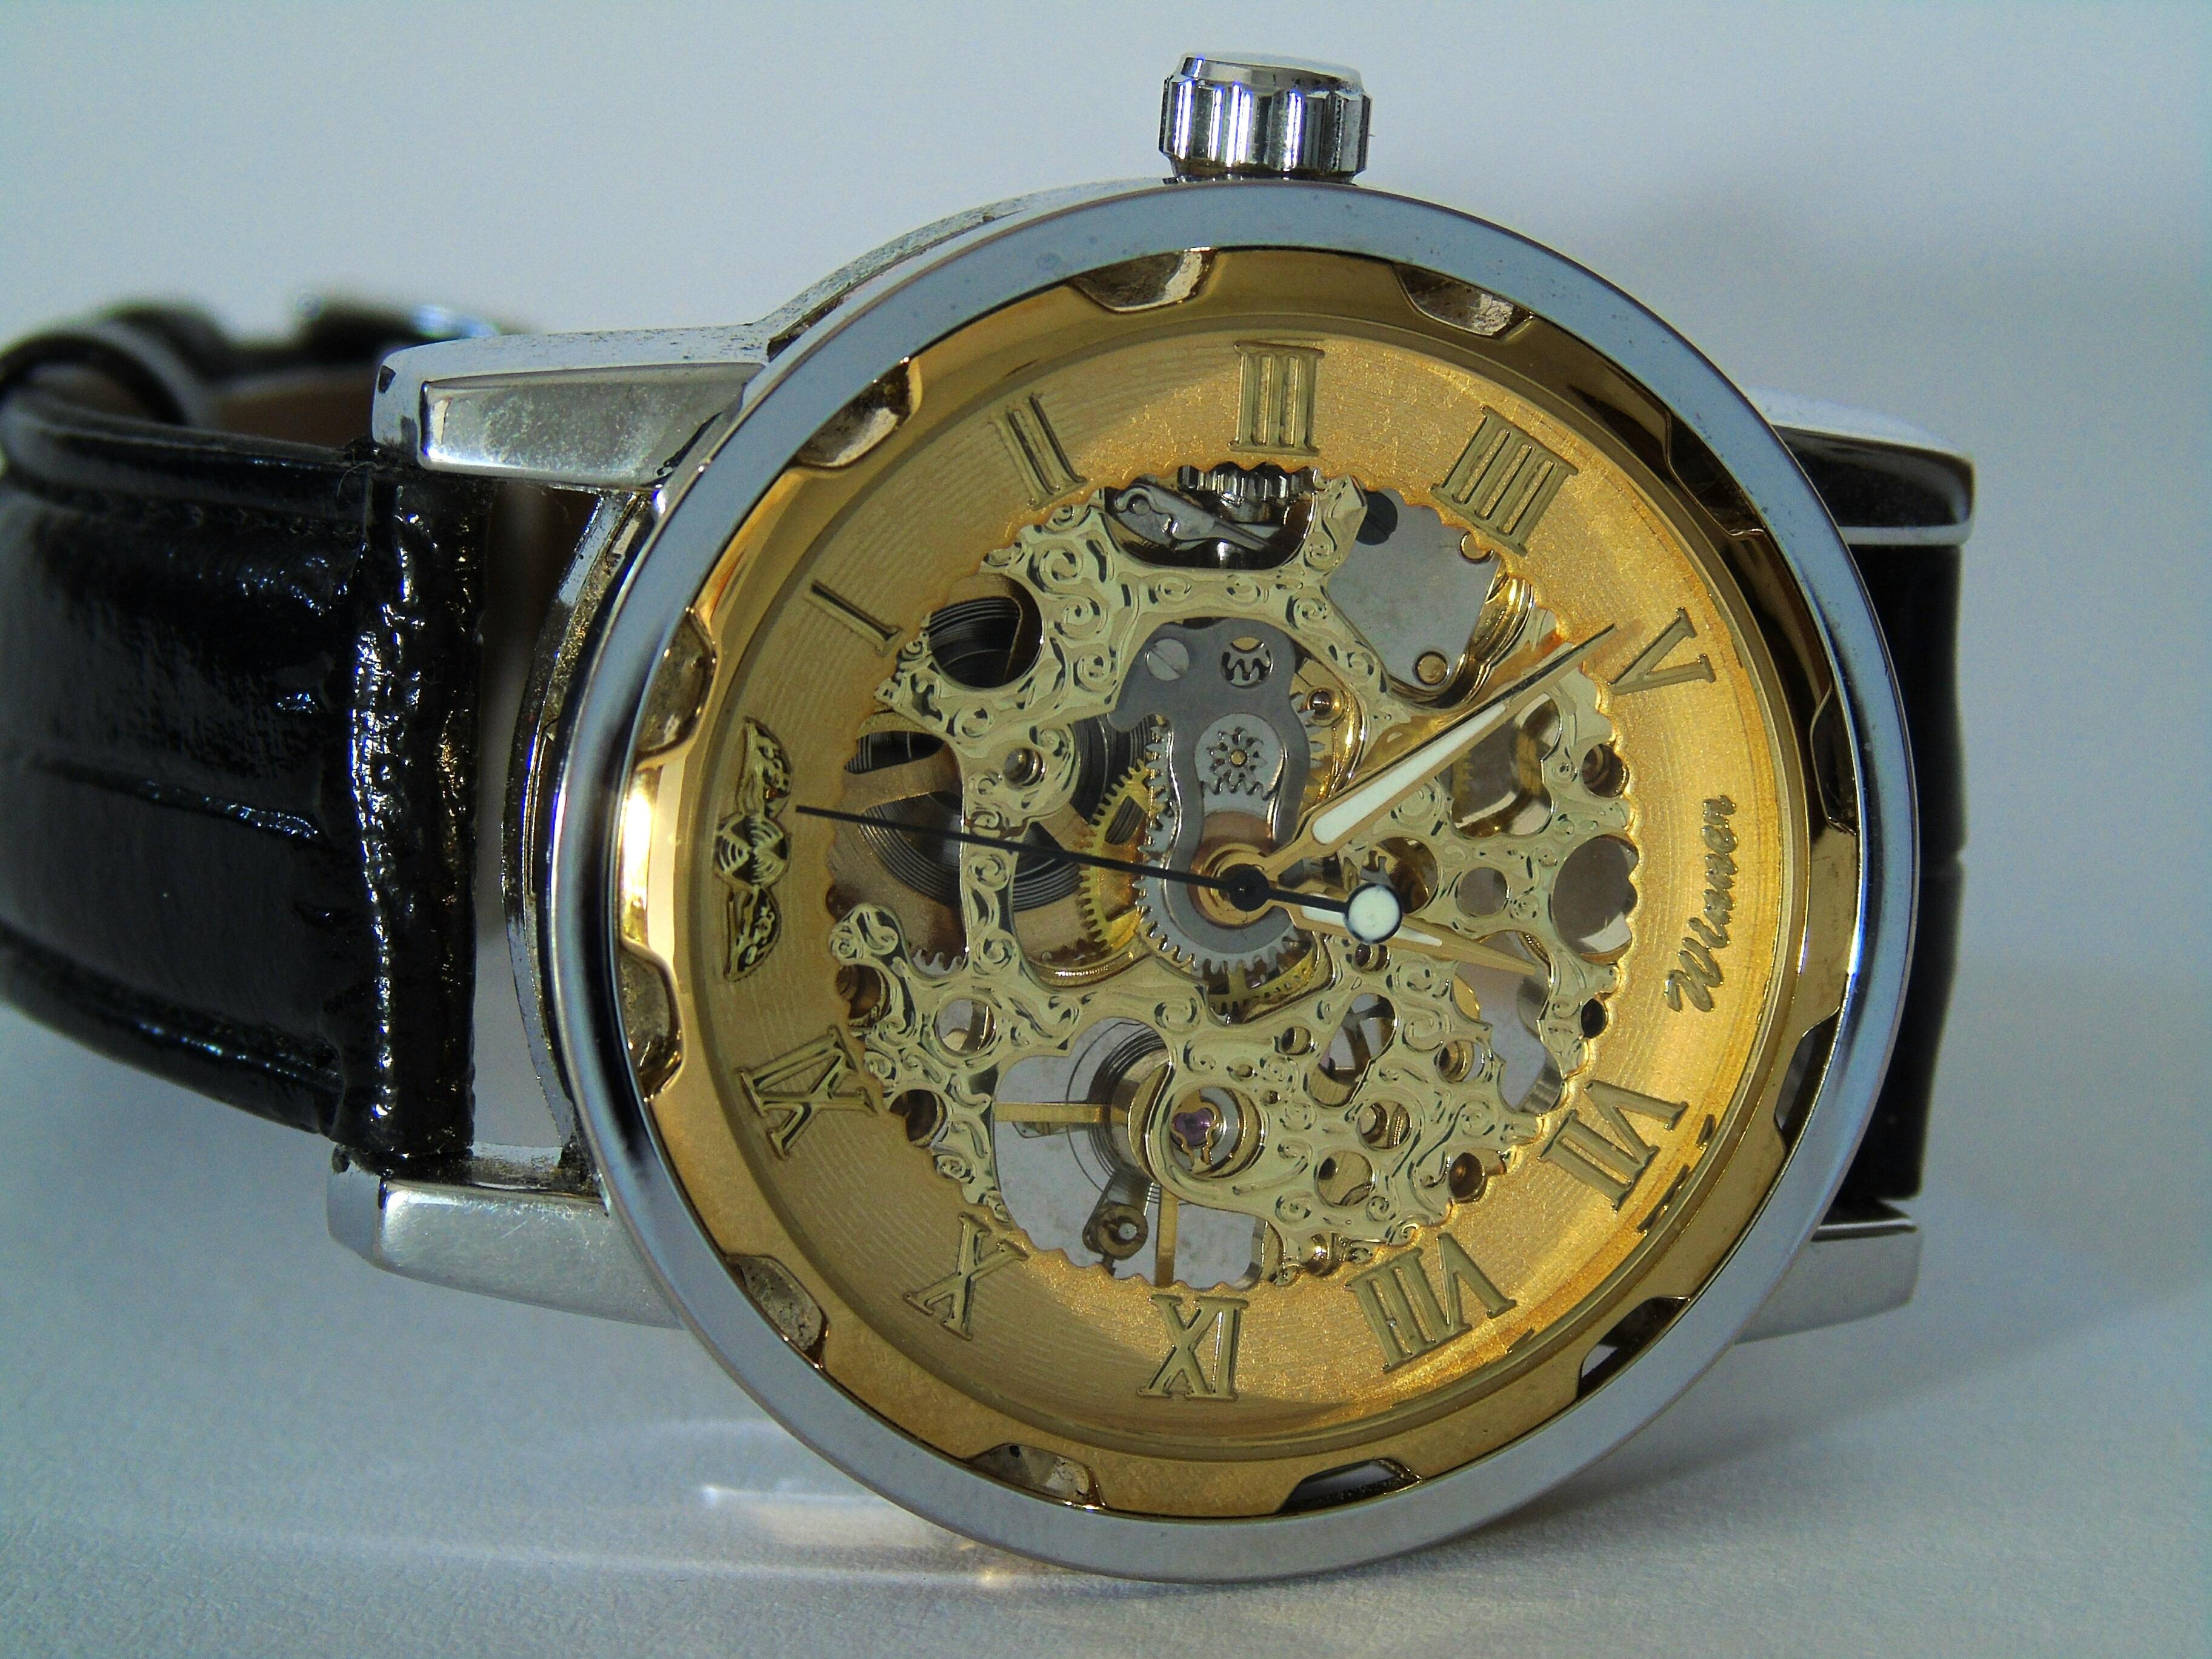 Free Images : hand, macro, close, timepiece, analog clock